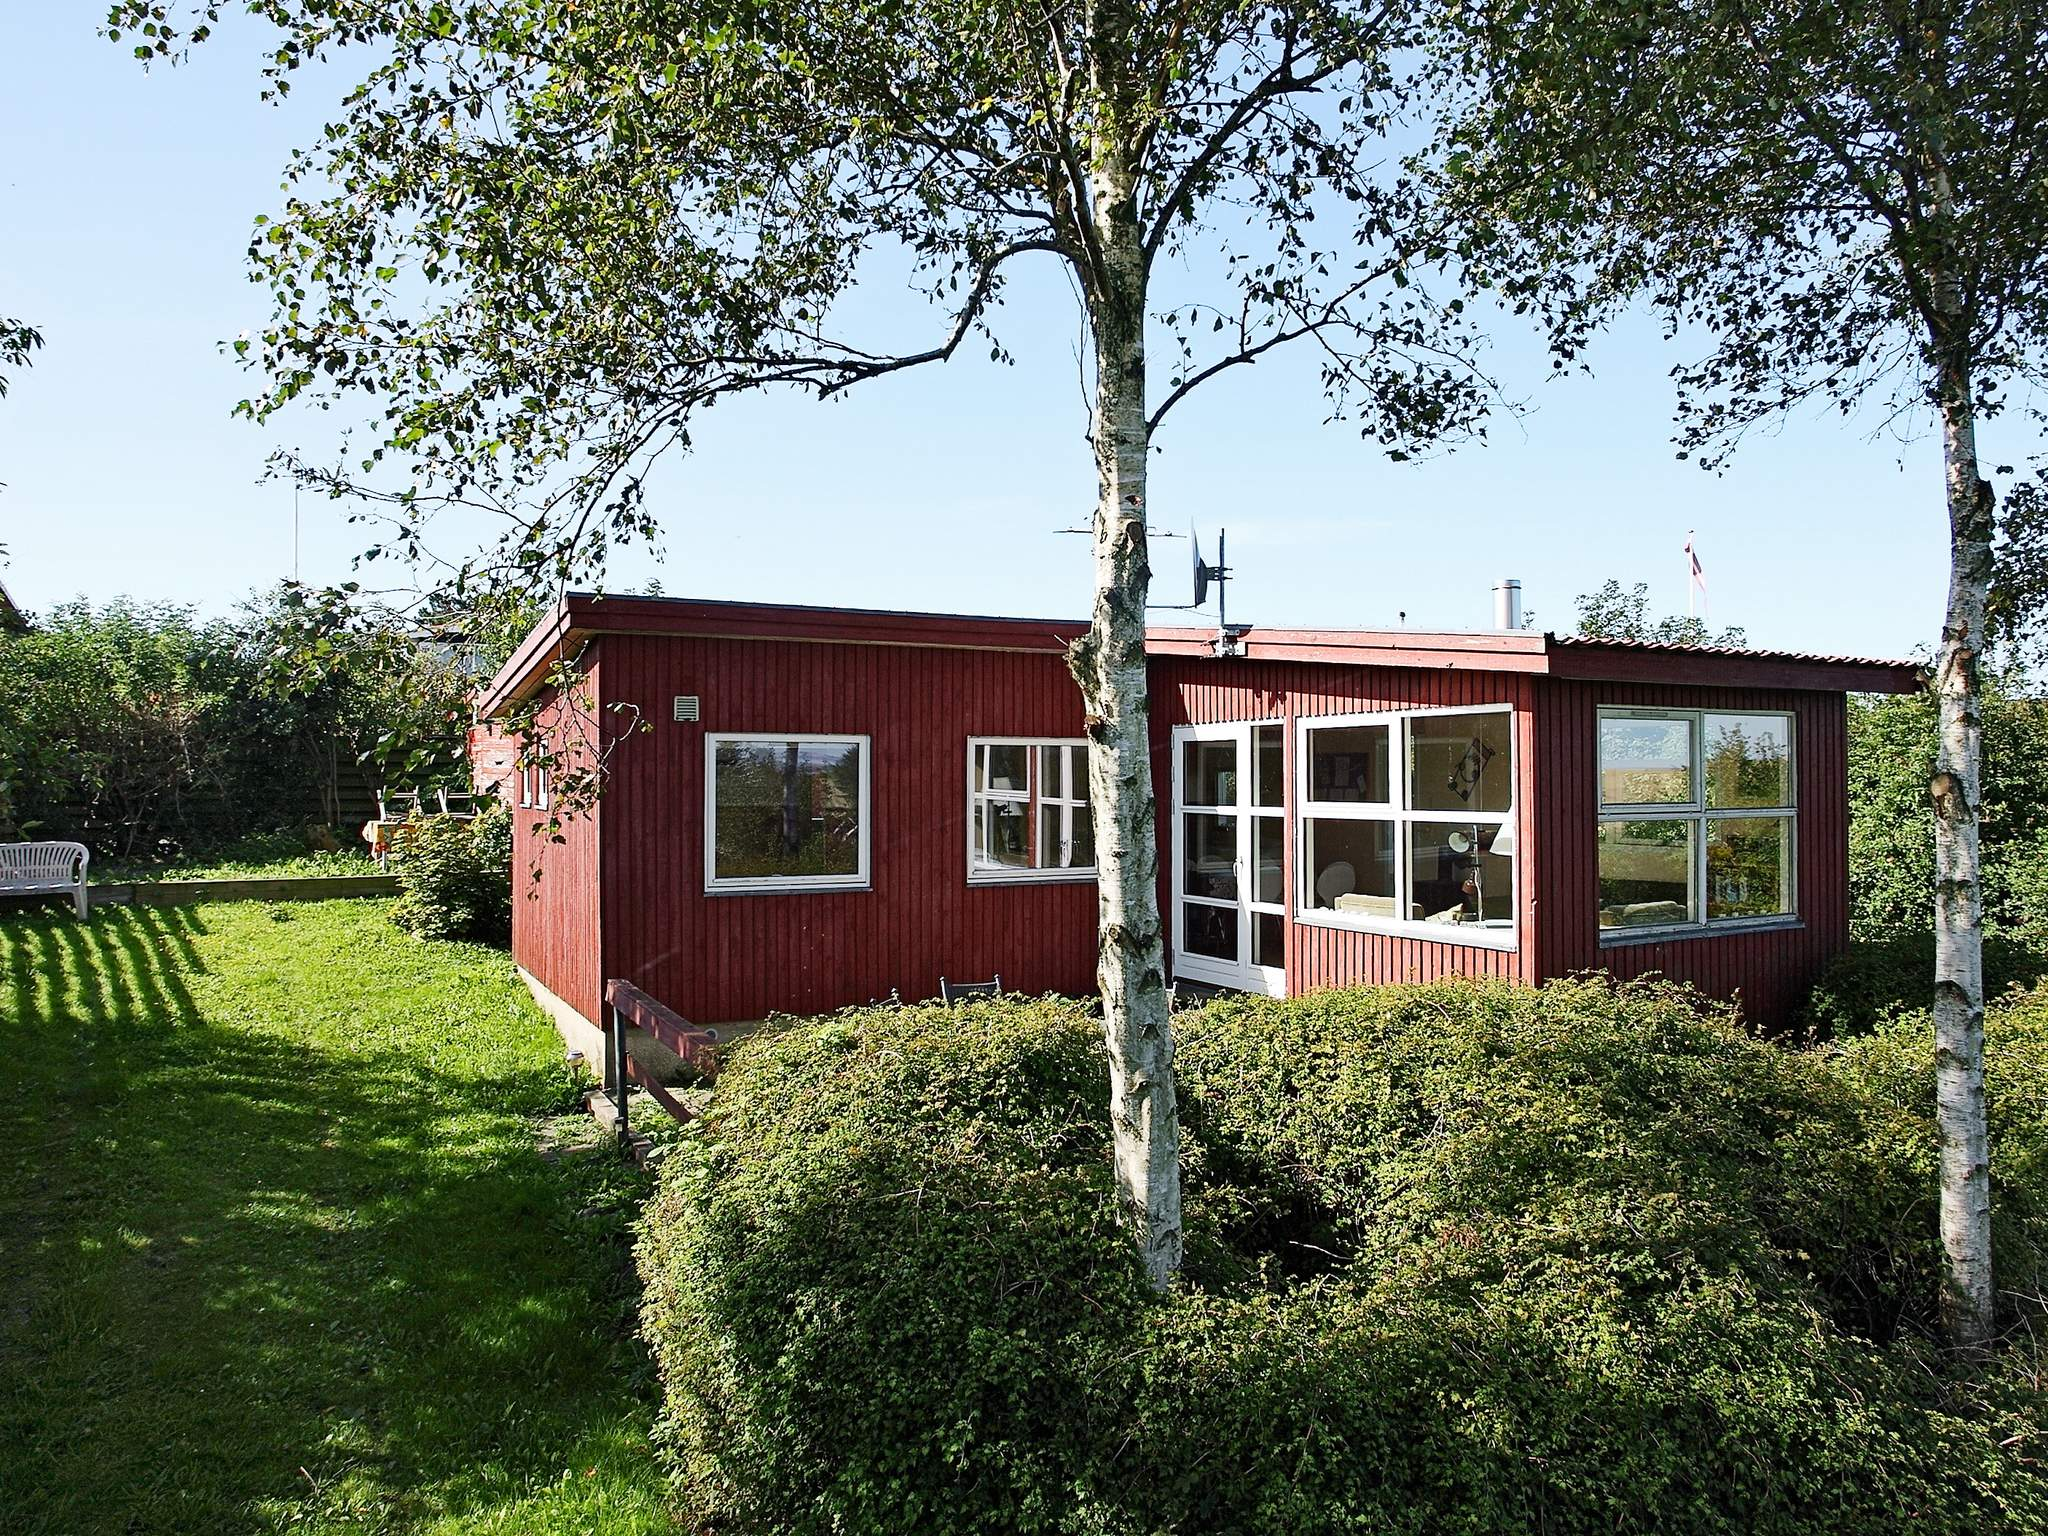 Ferienhaus Eskov Strandpark (83023), Roslev, , Limfjord, Dänemark, Bild 1